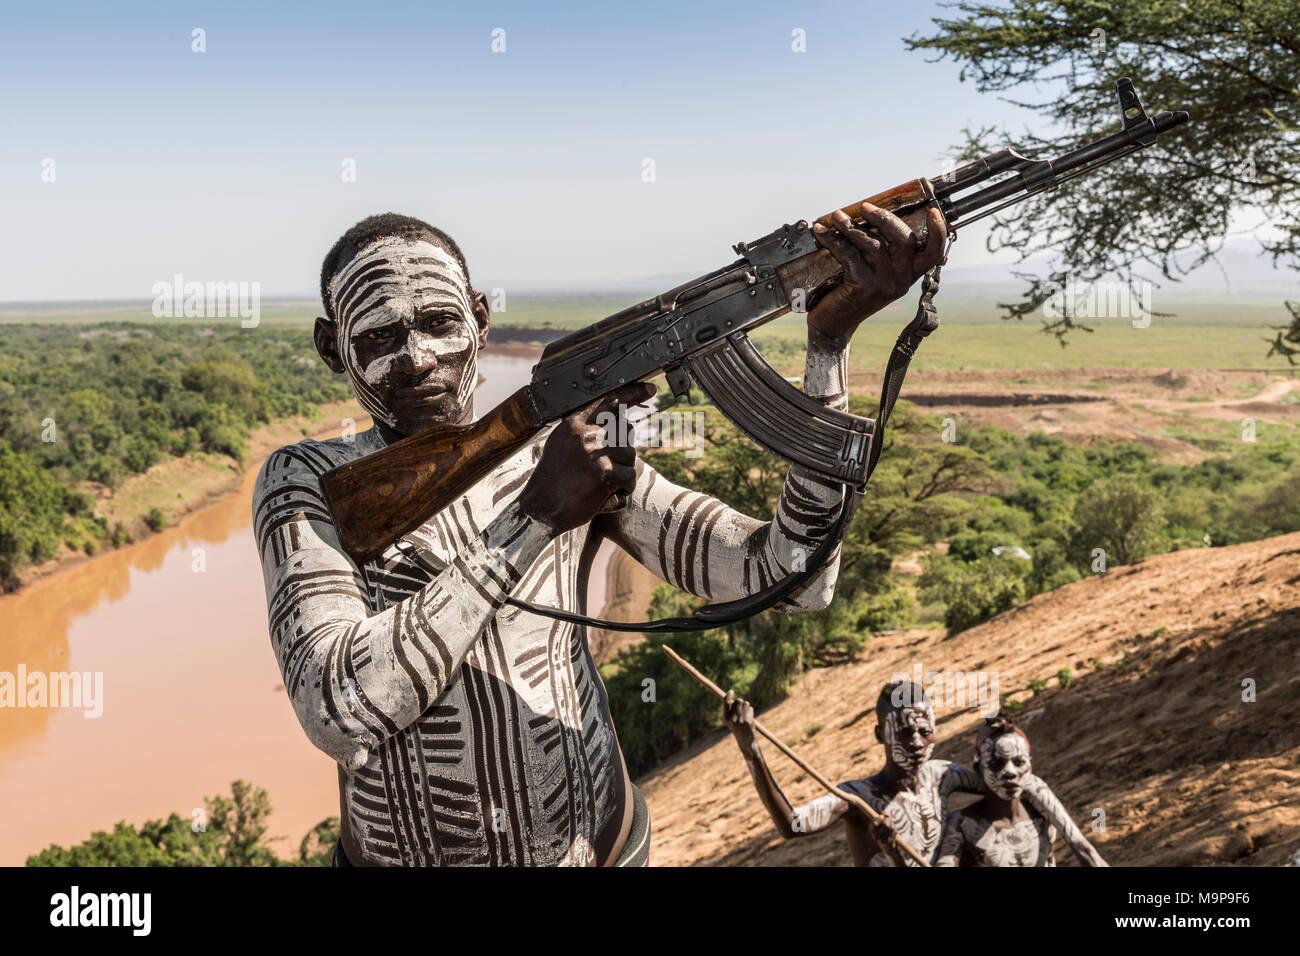 Warrior with rifle, Kalashnikov, AK47, Karo tribe, back Grandma River, Southern Nations Nationalities and Peoples' Region - Stock Image